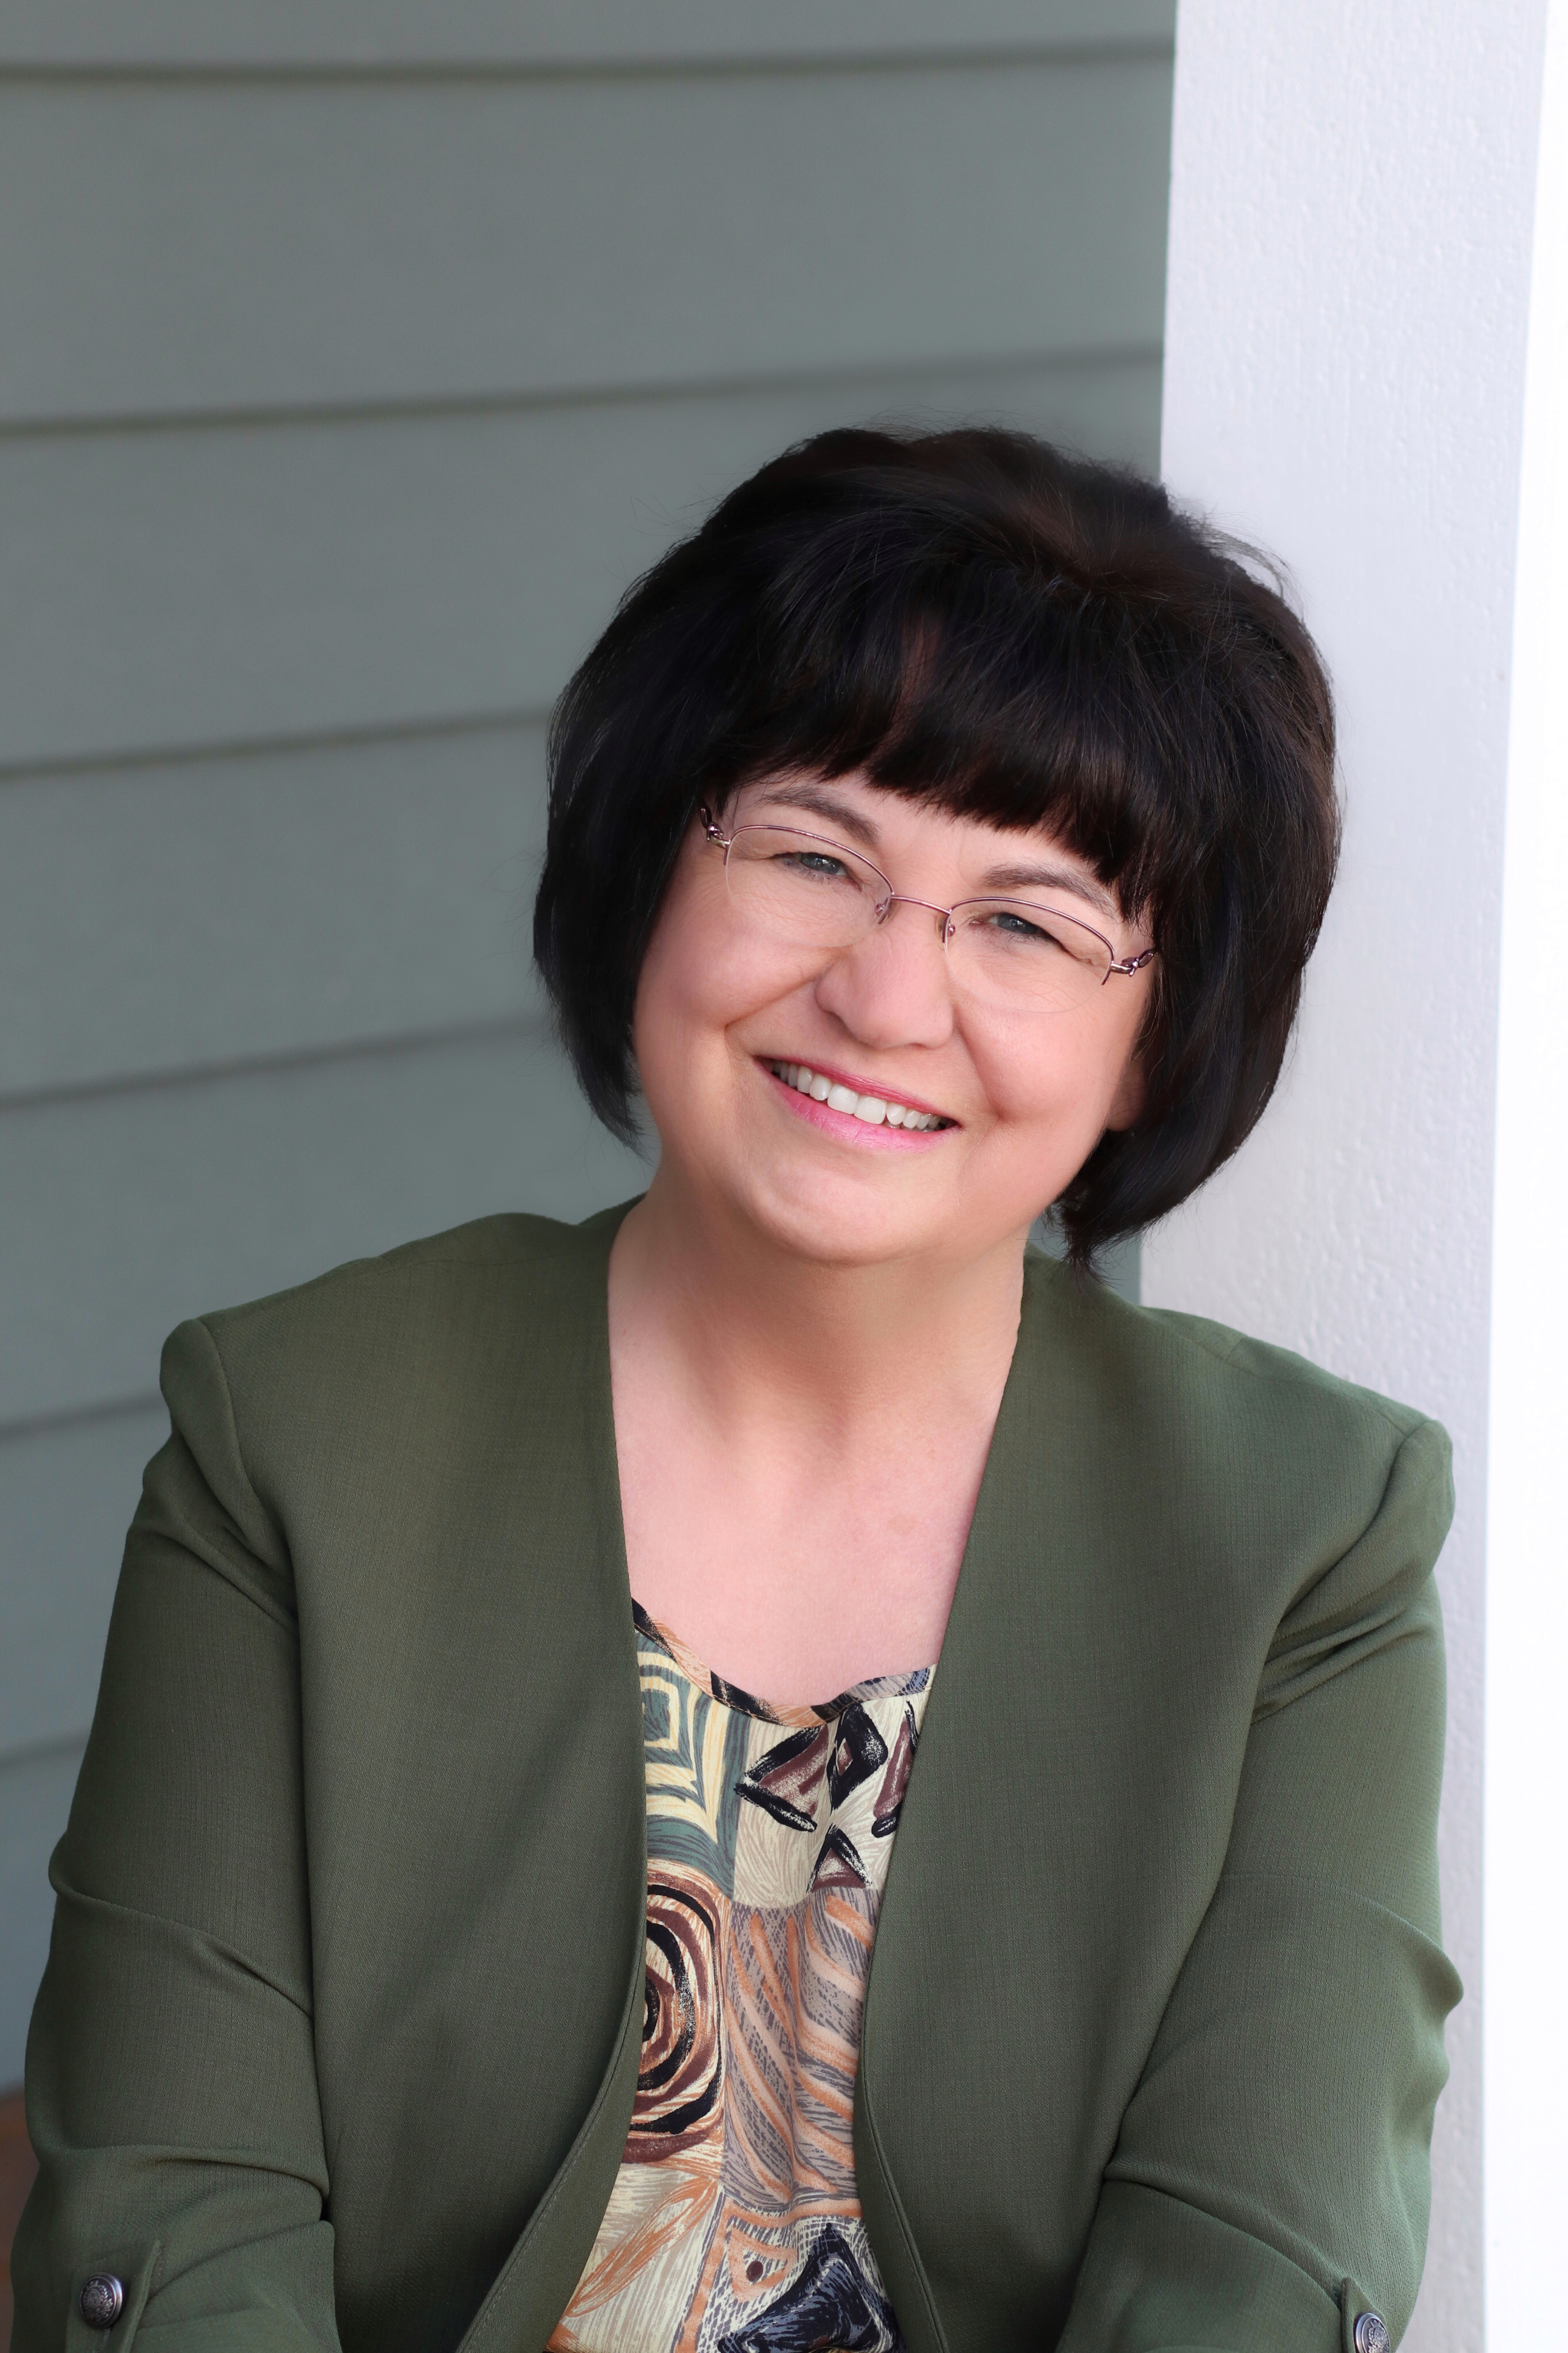 Katie L. Ambrose